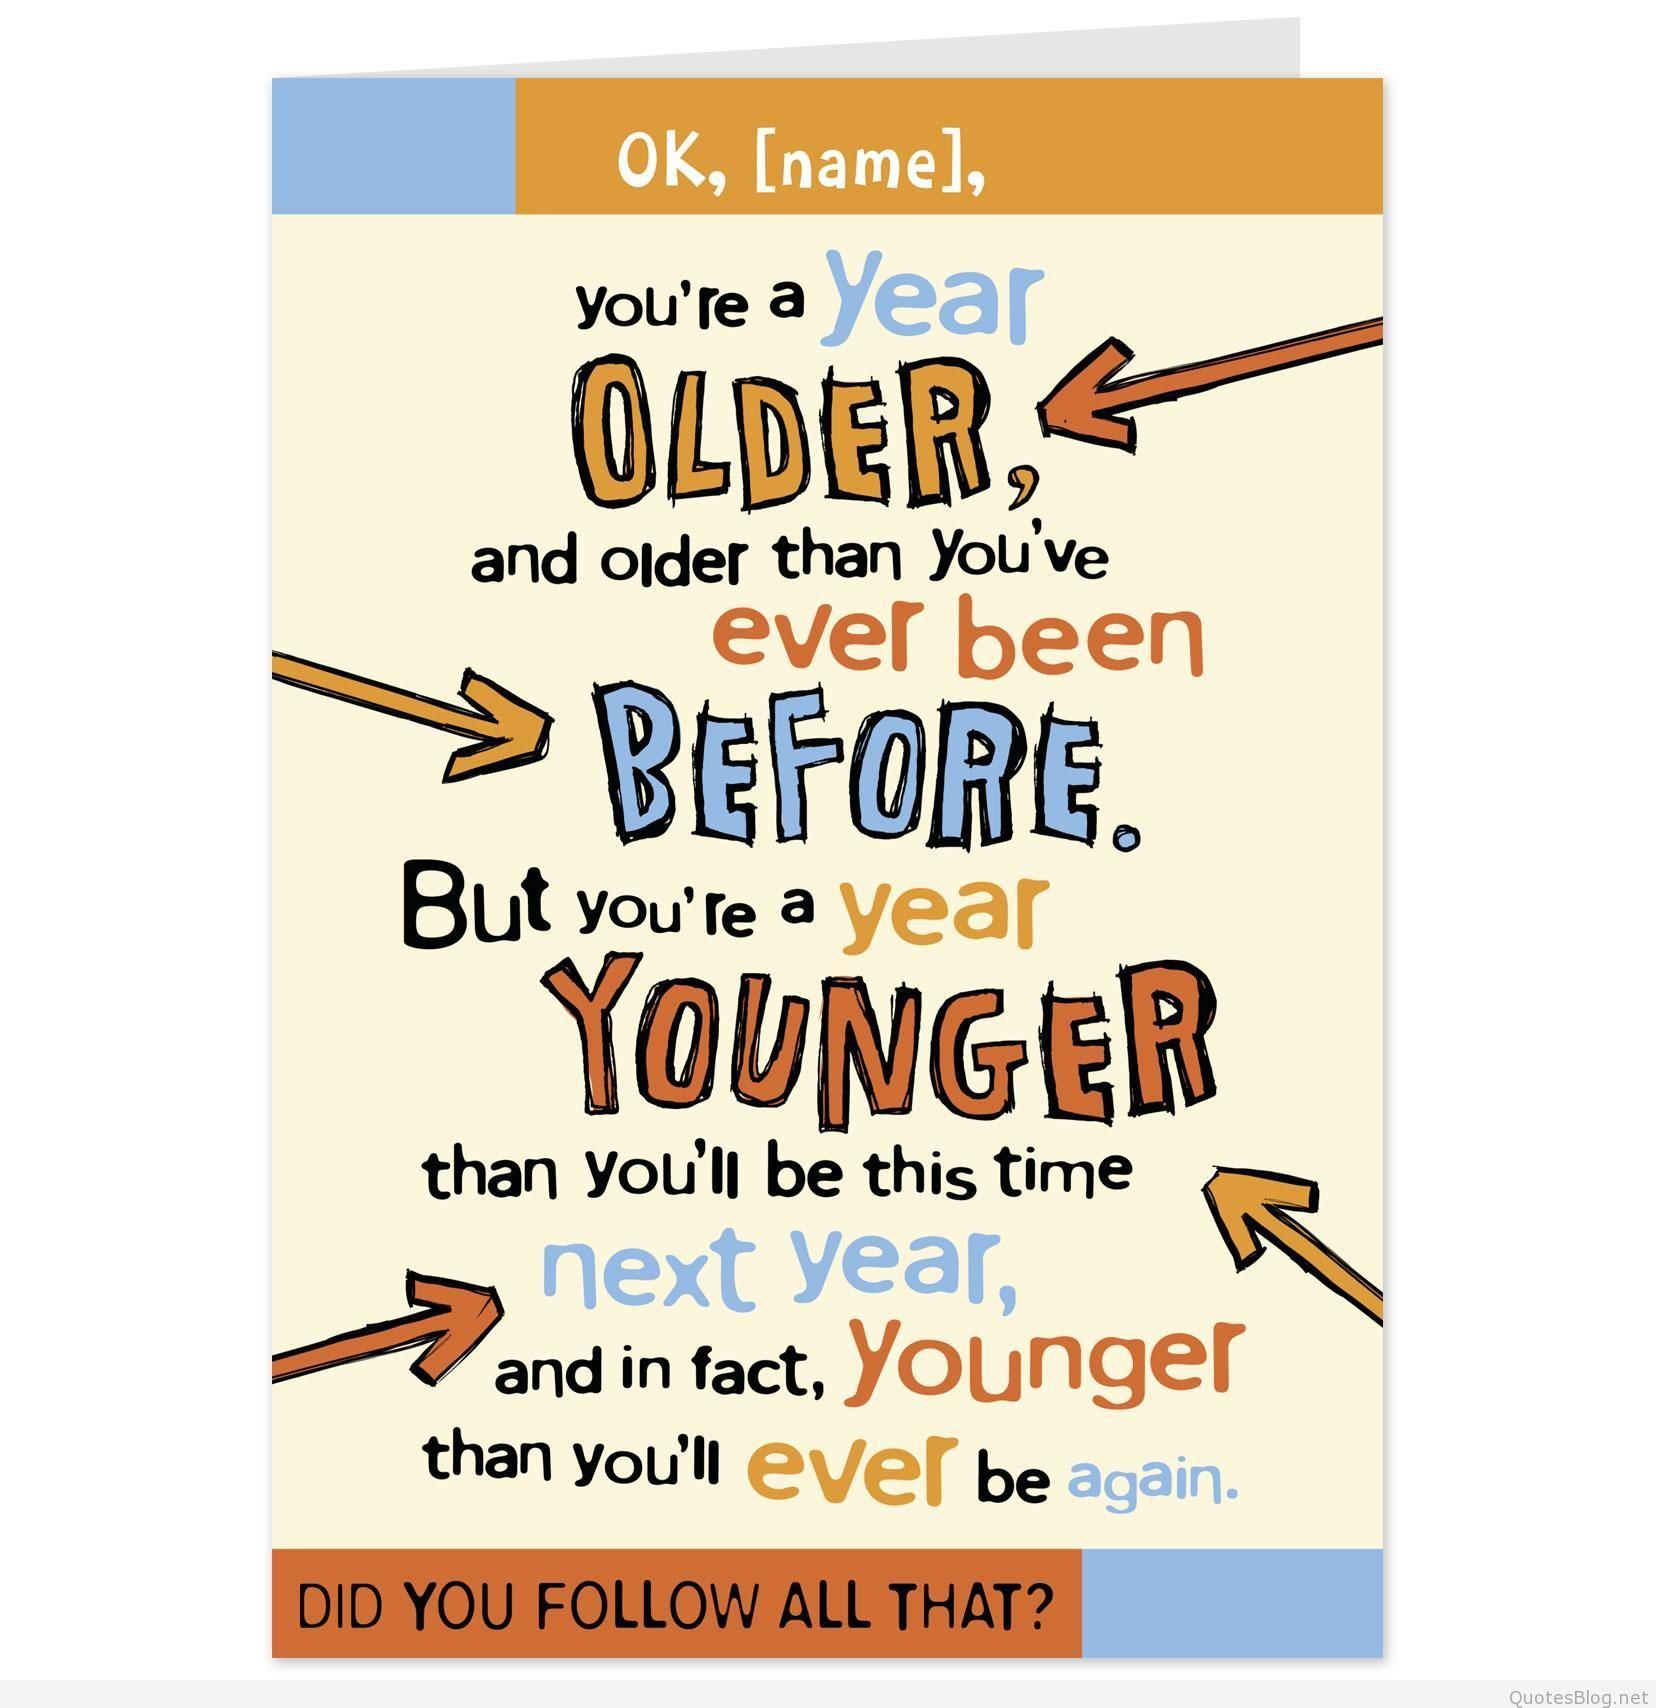 birthdayinvitationscardfunnybirthdaywishesawesomefunnybday – Awesome Birthday Cards